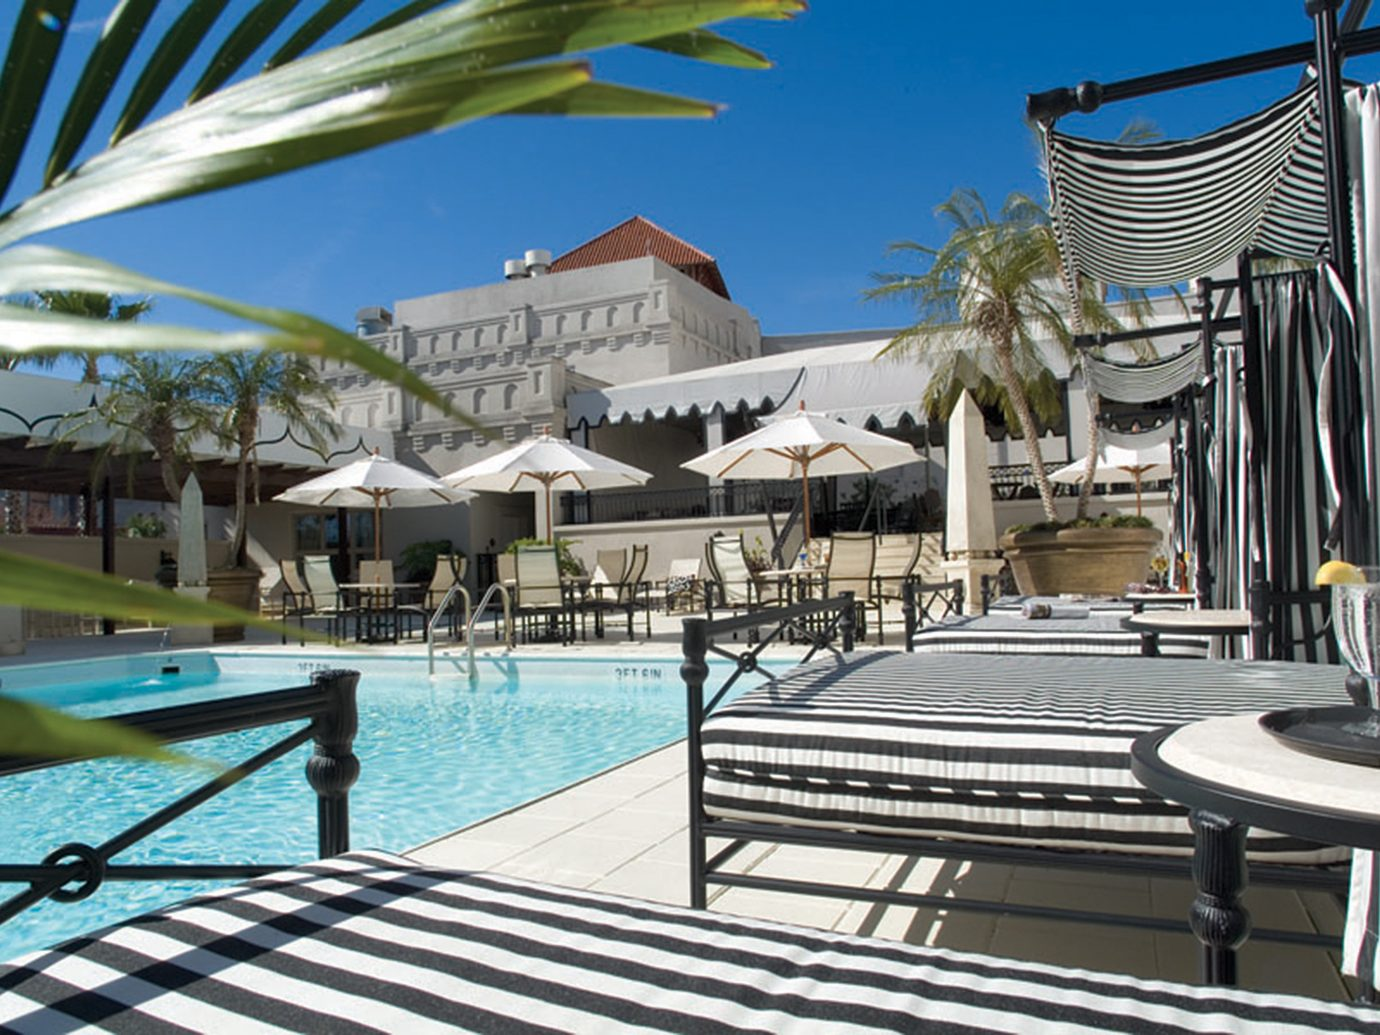 Deck Lounge Patio Pool Trip Ideas ground leisure chair property Resort swimming pool estate vacation condominium Villa caribbean real estate mansion